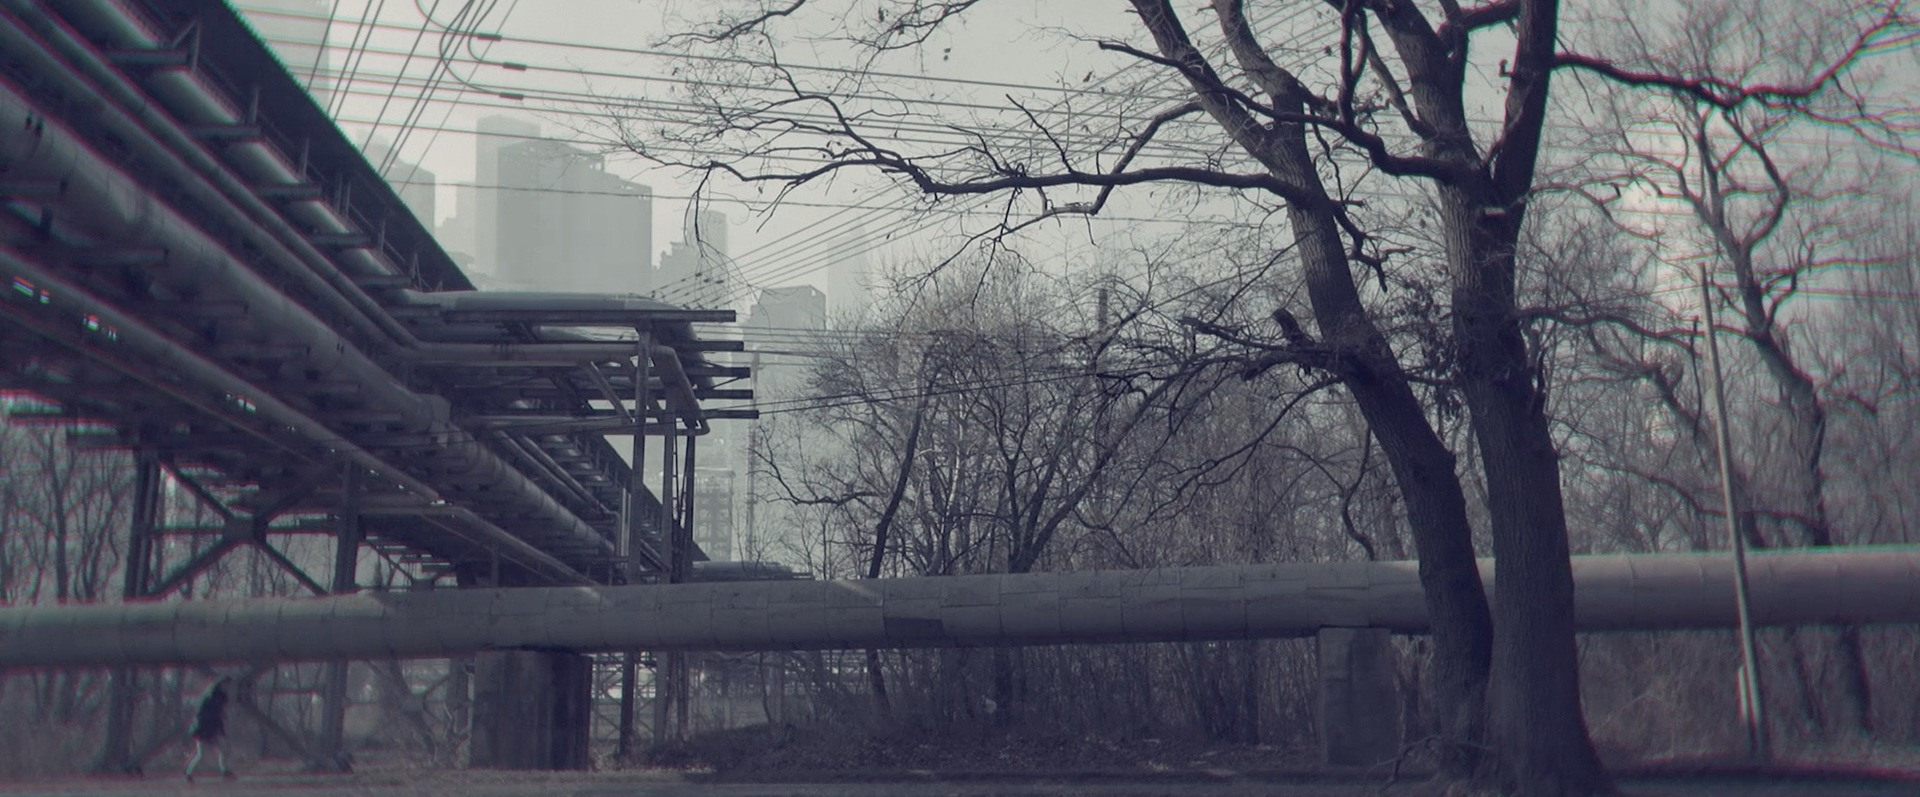 ▷ The Swan - short film